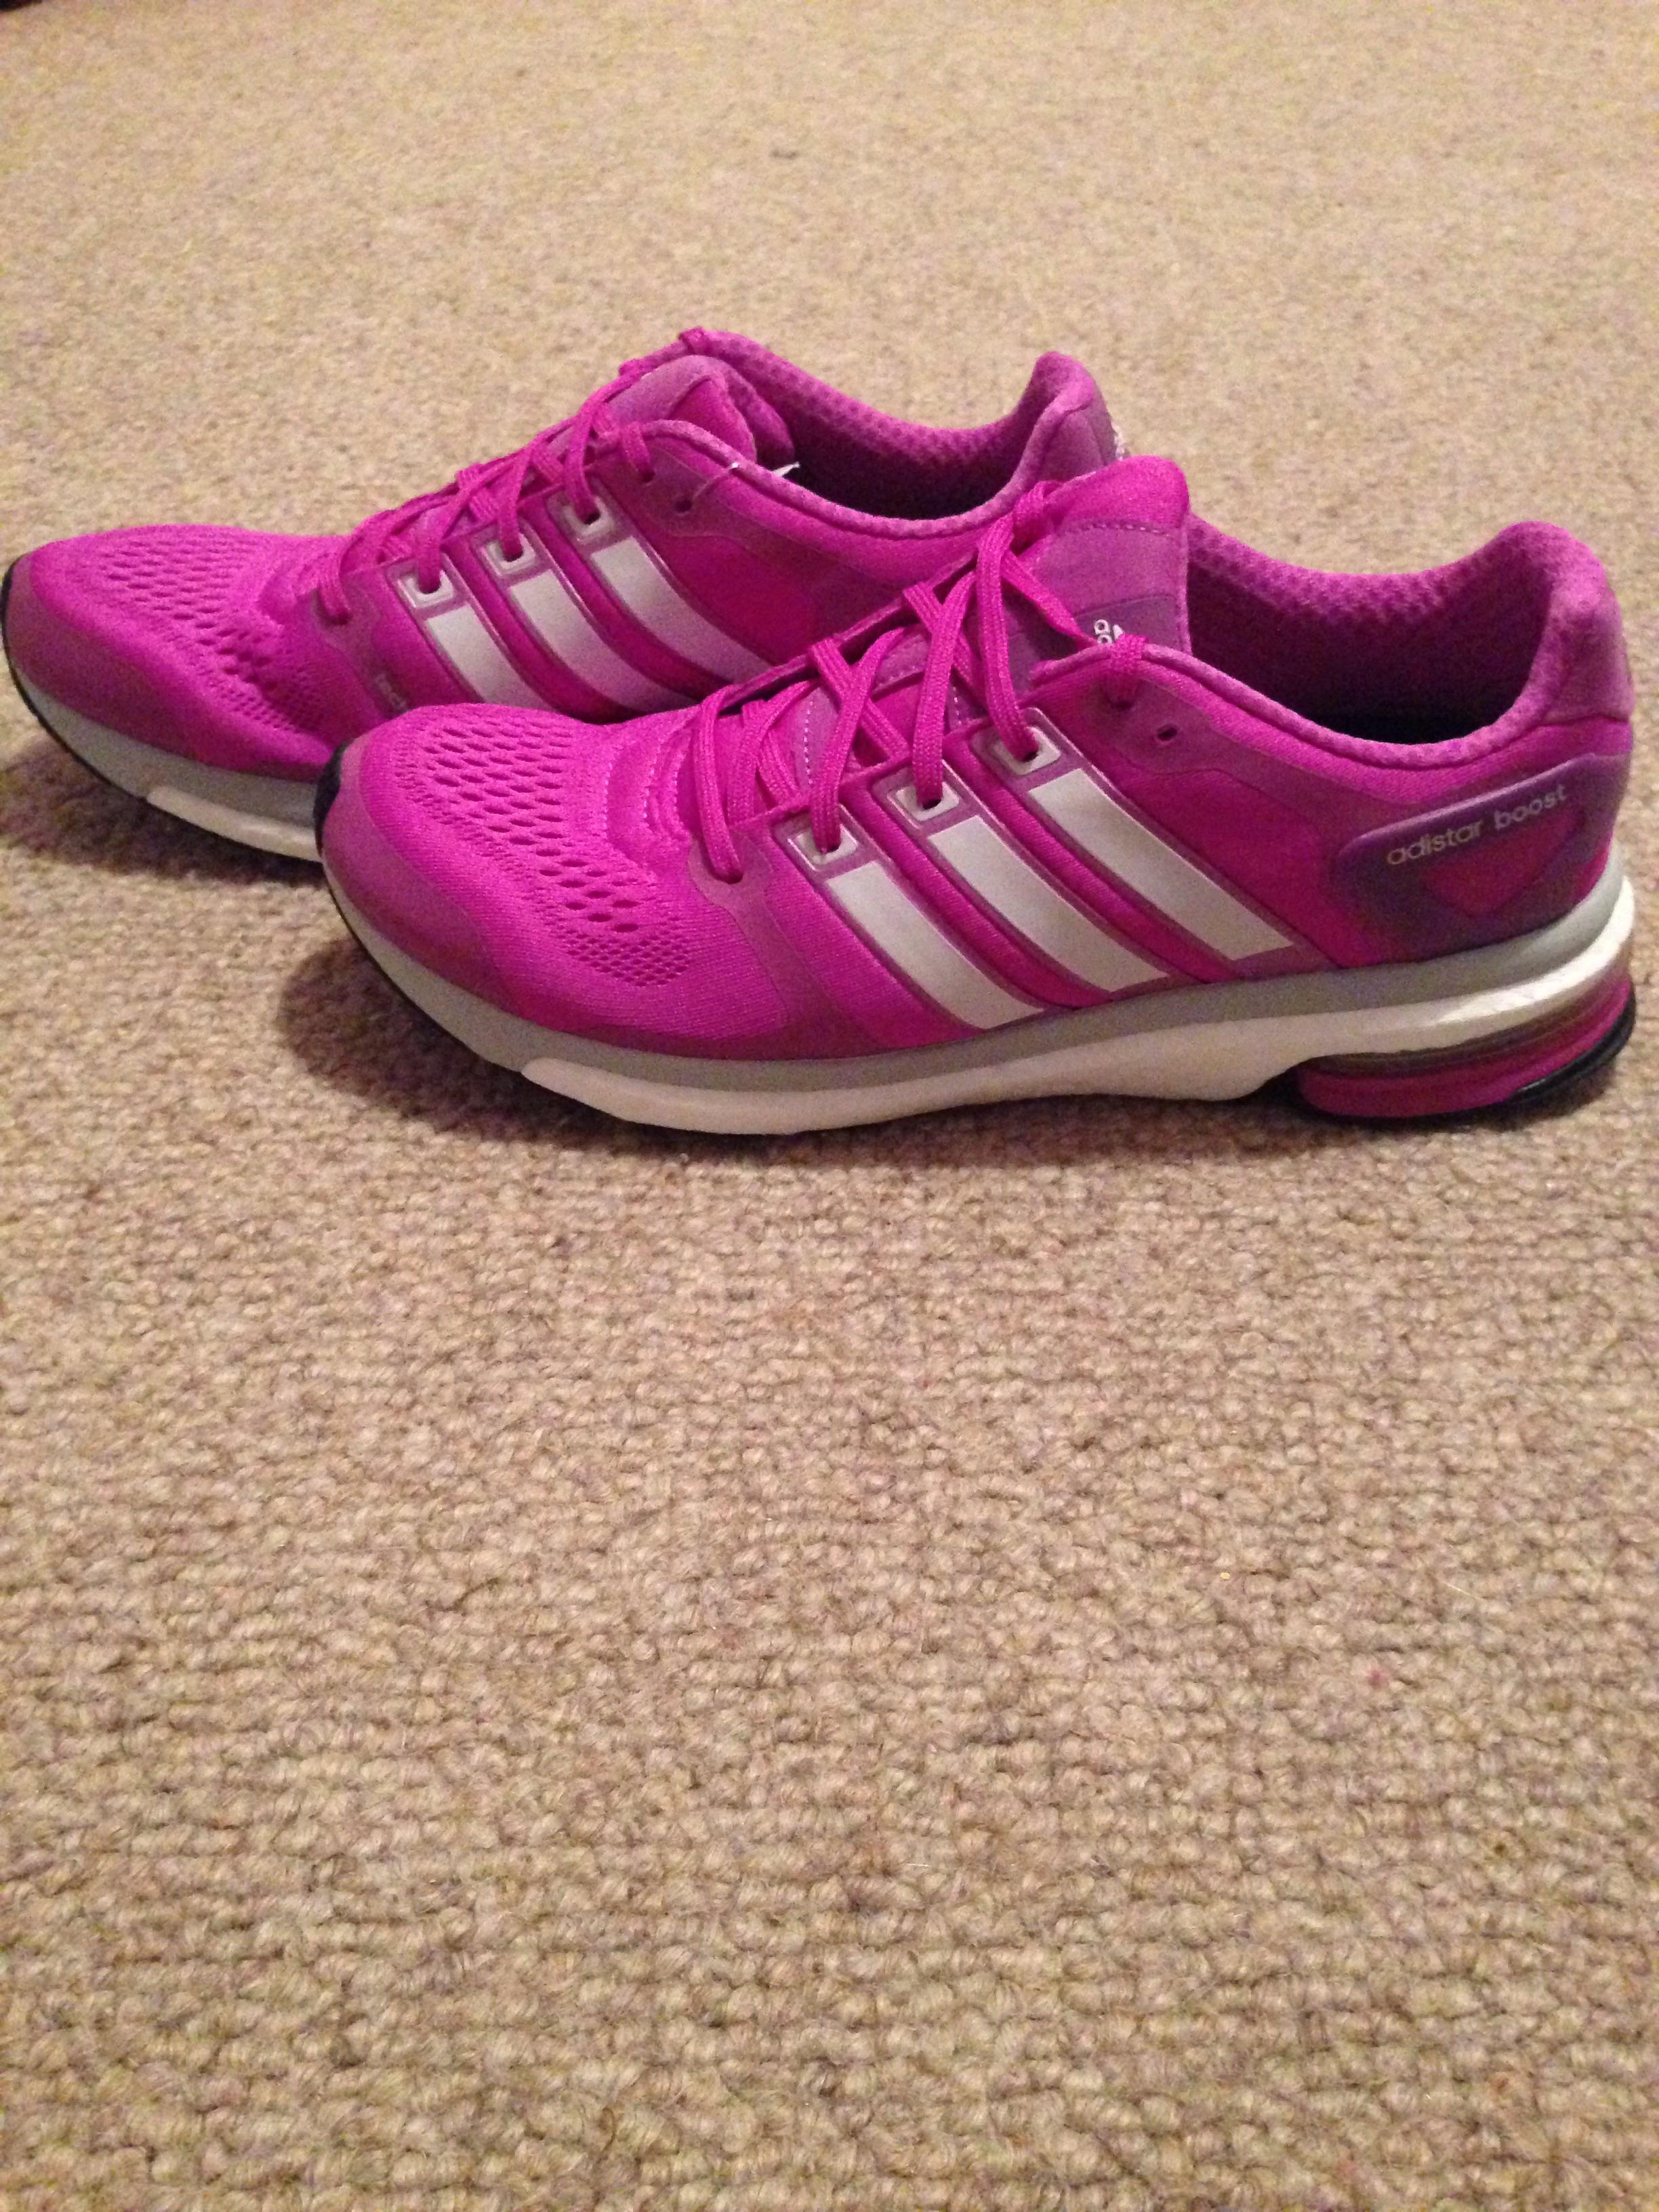 wholesale dealer dac2a 5ed8d Shoe Review Adidas Adistar Boostl